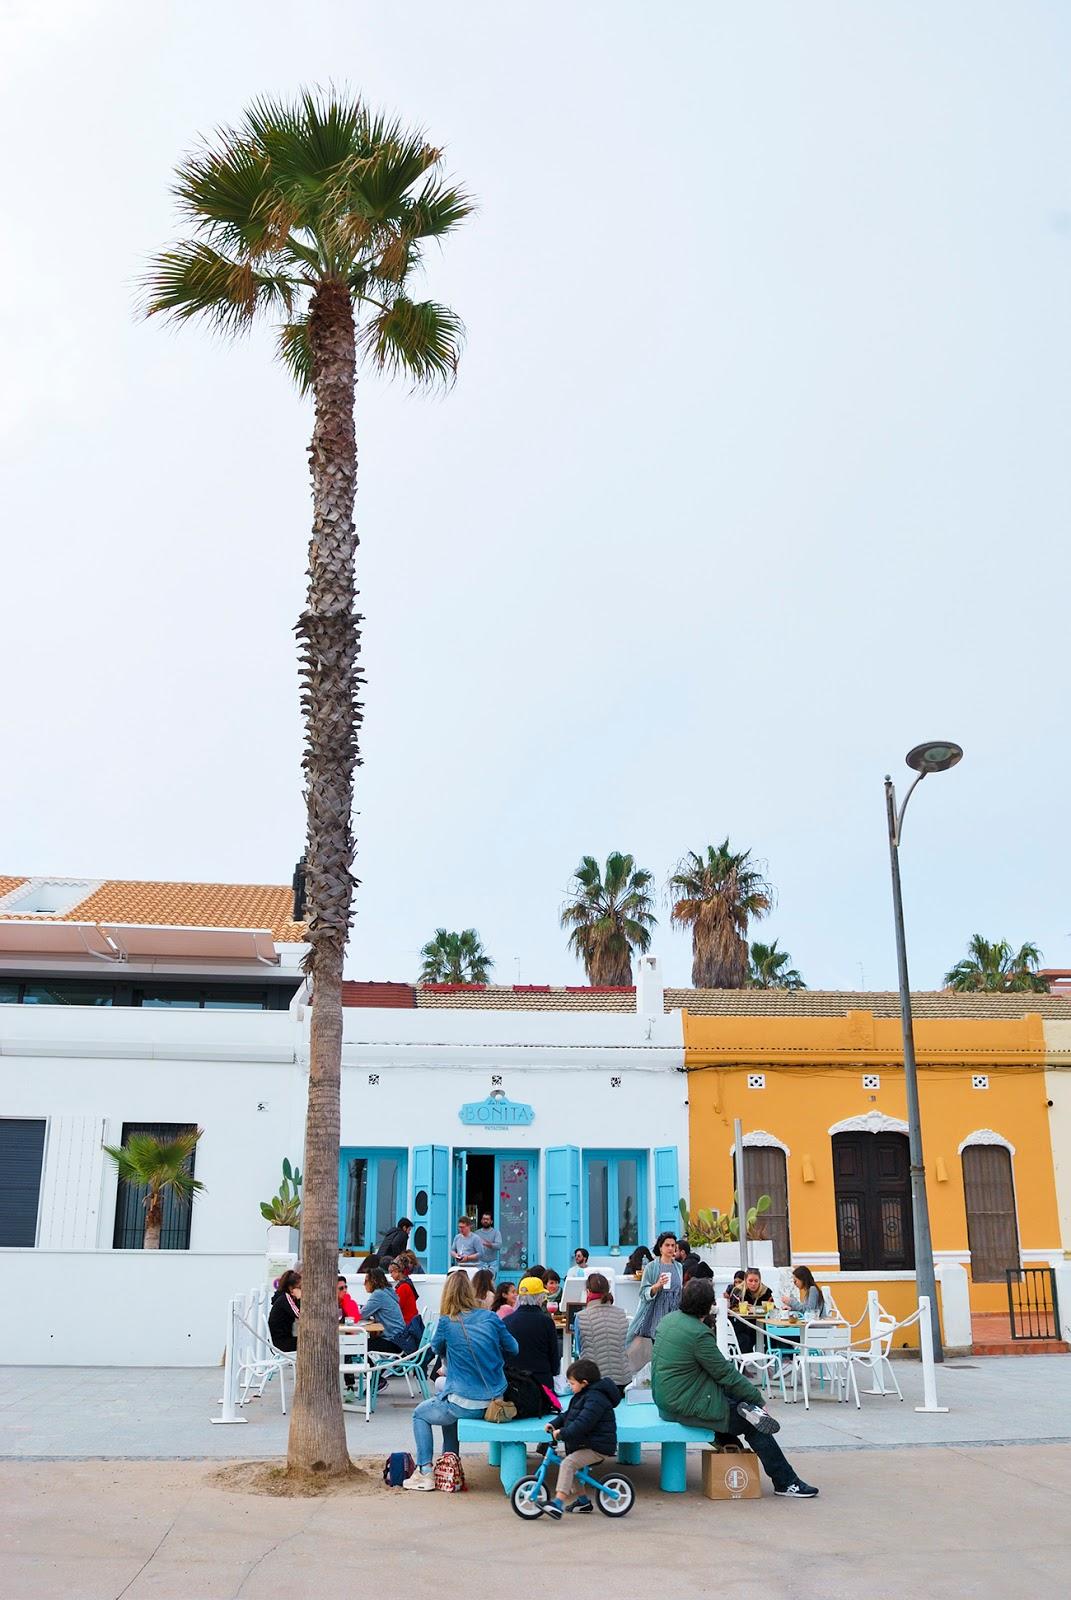 la mas bonita patacona playa beach valencia donde comer where to eat